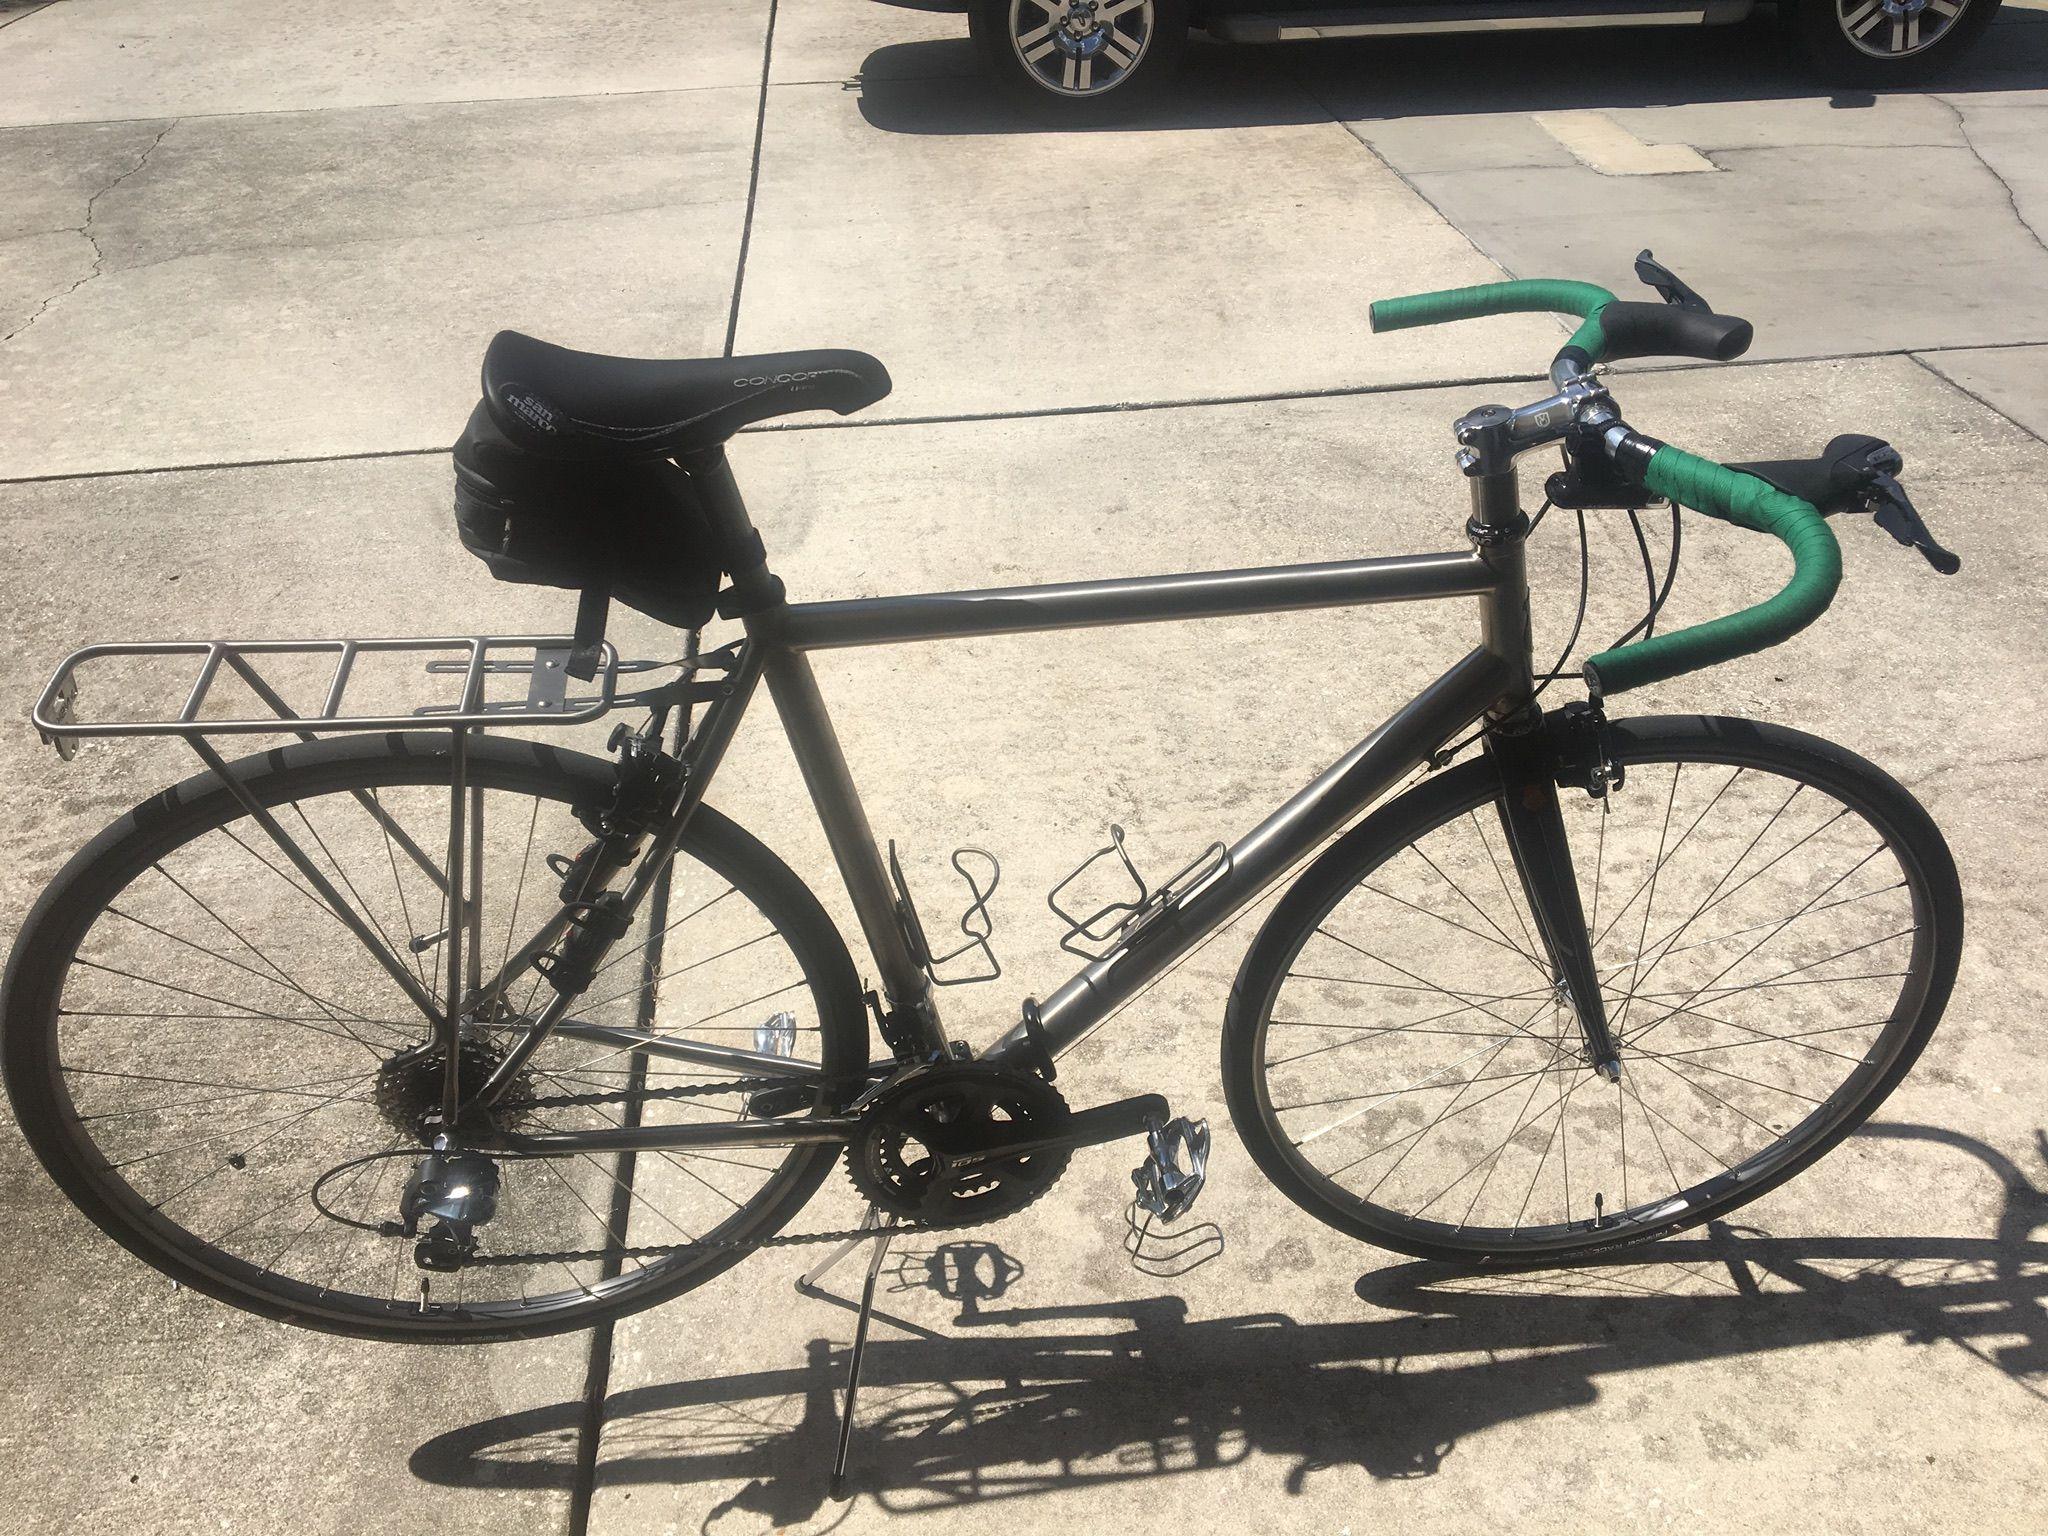 David39s Stoater Rohloff With Tubus Racks Touring Bike